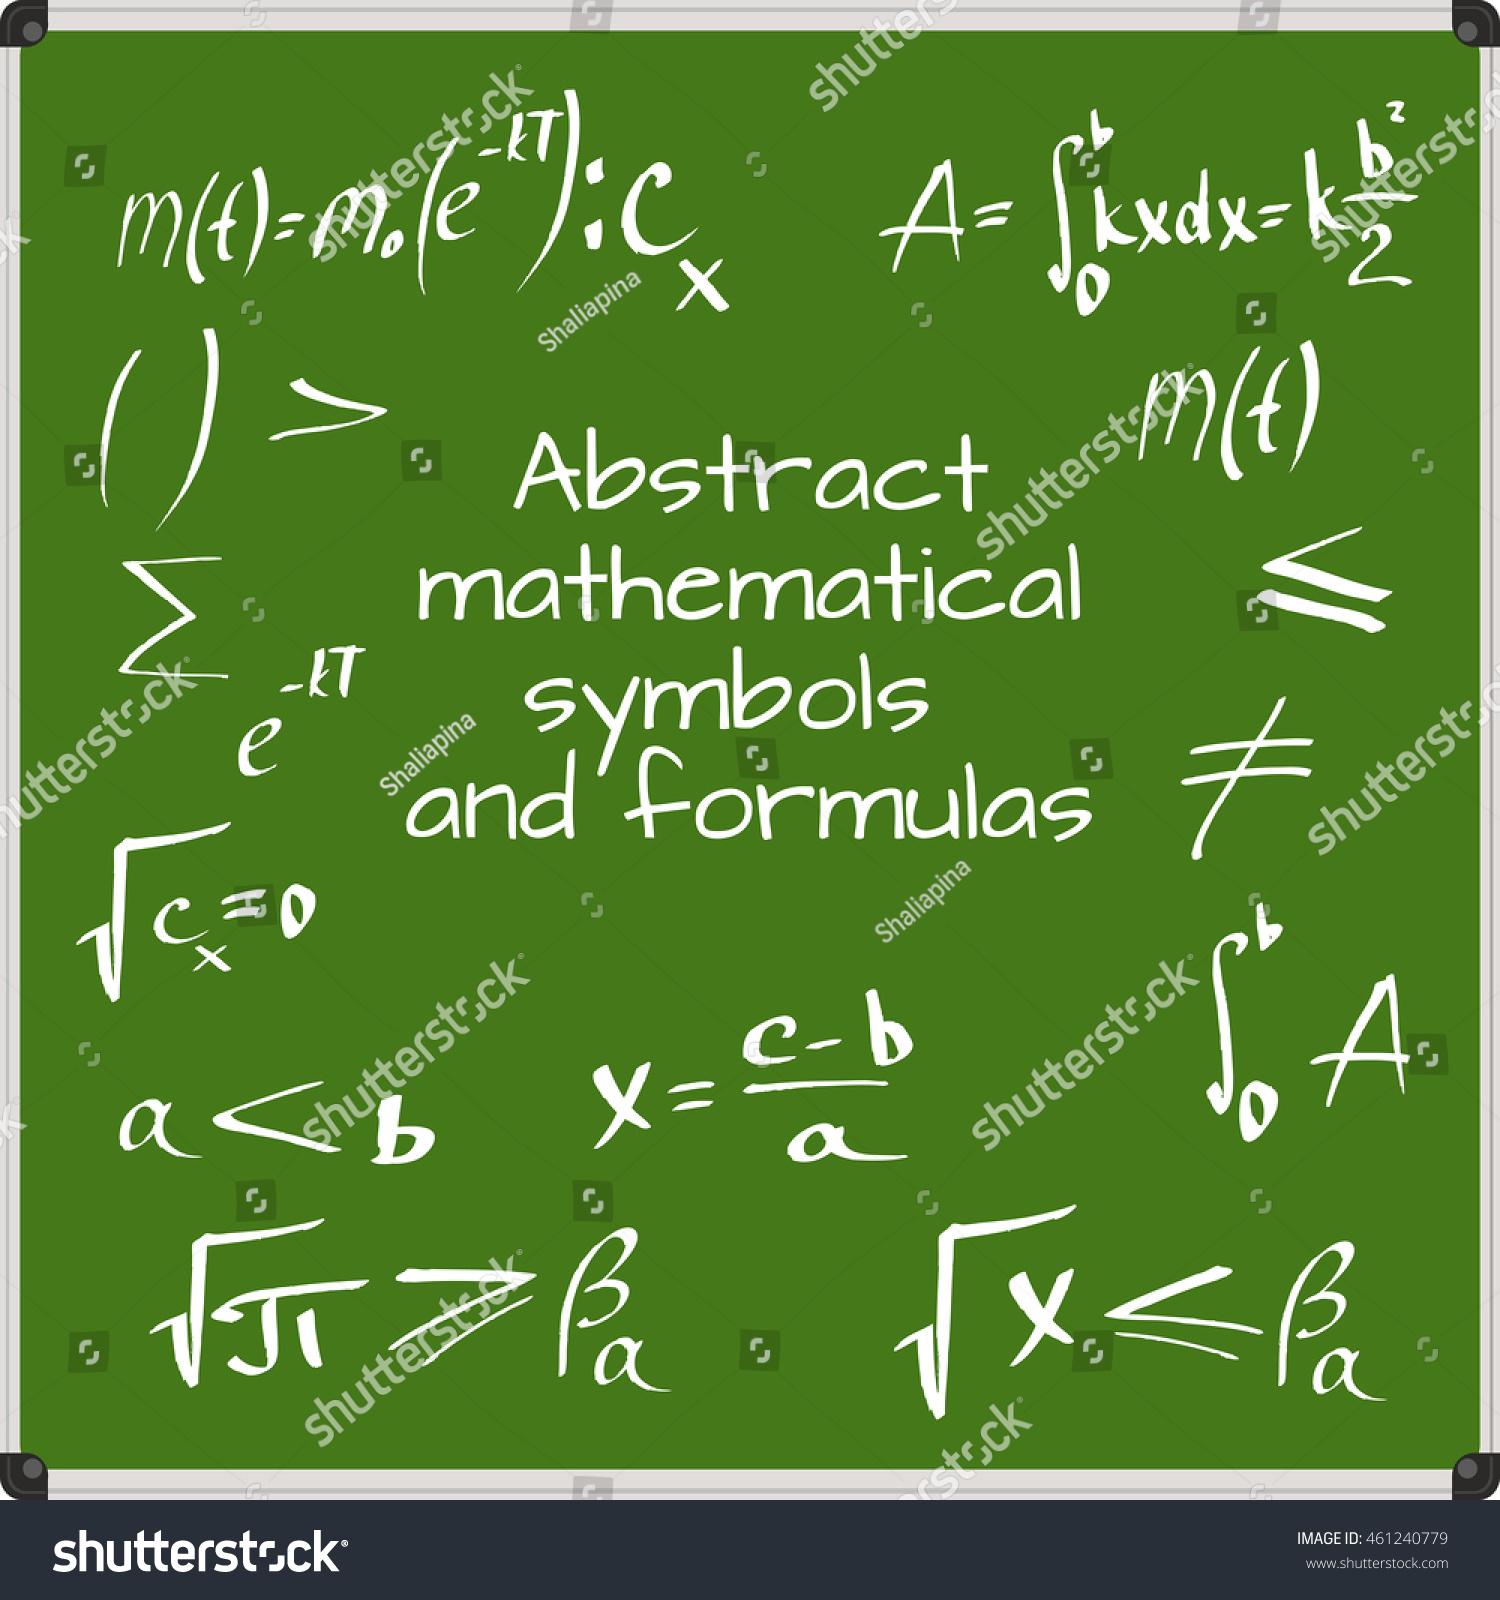 Abstract mathematical symbols formulas stock vector 461240779 abstract mathematical symbols and formulas biocorpaavc Gallery